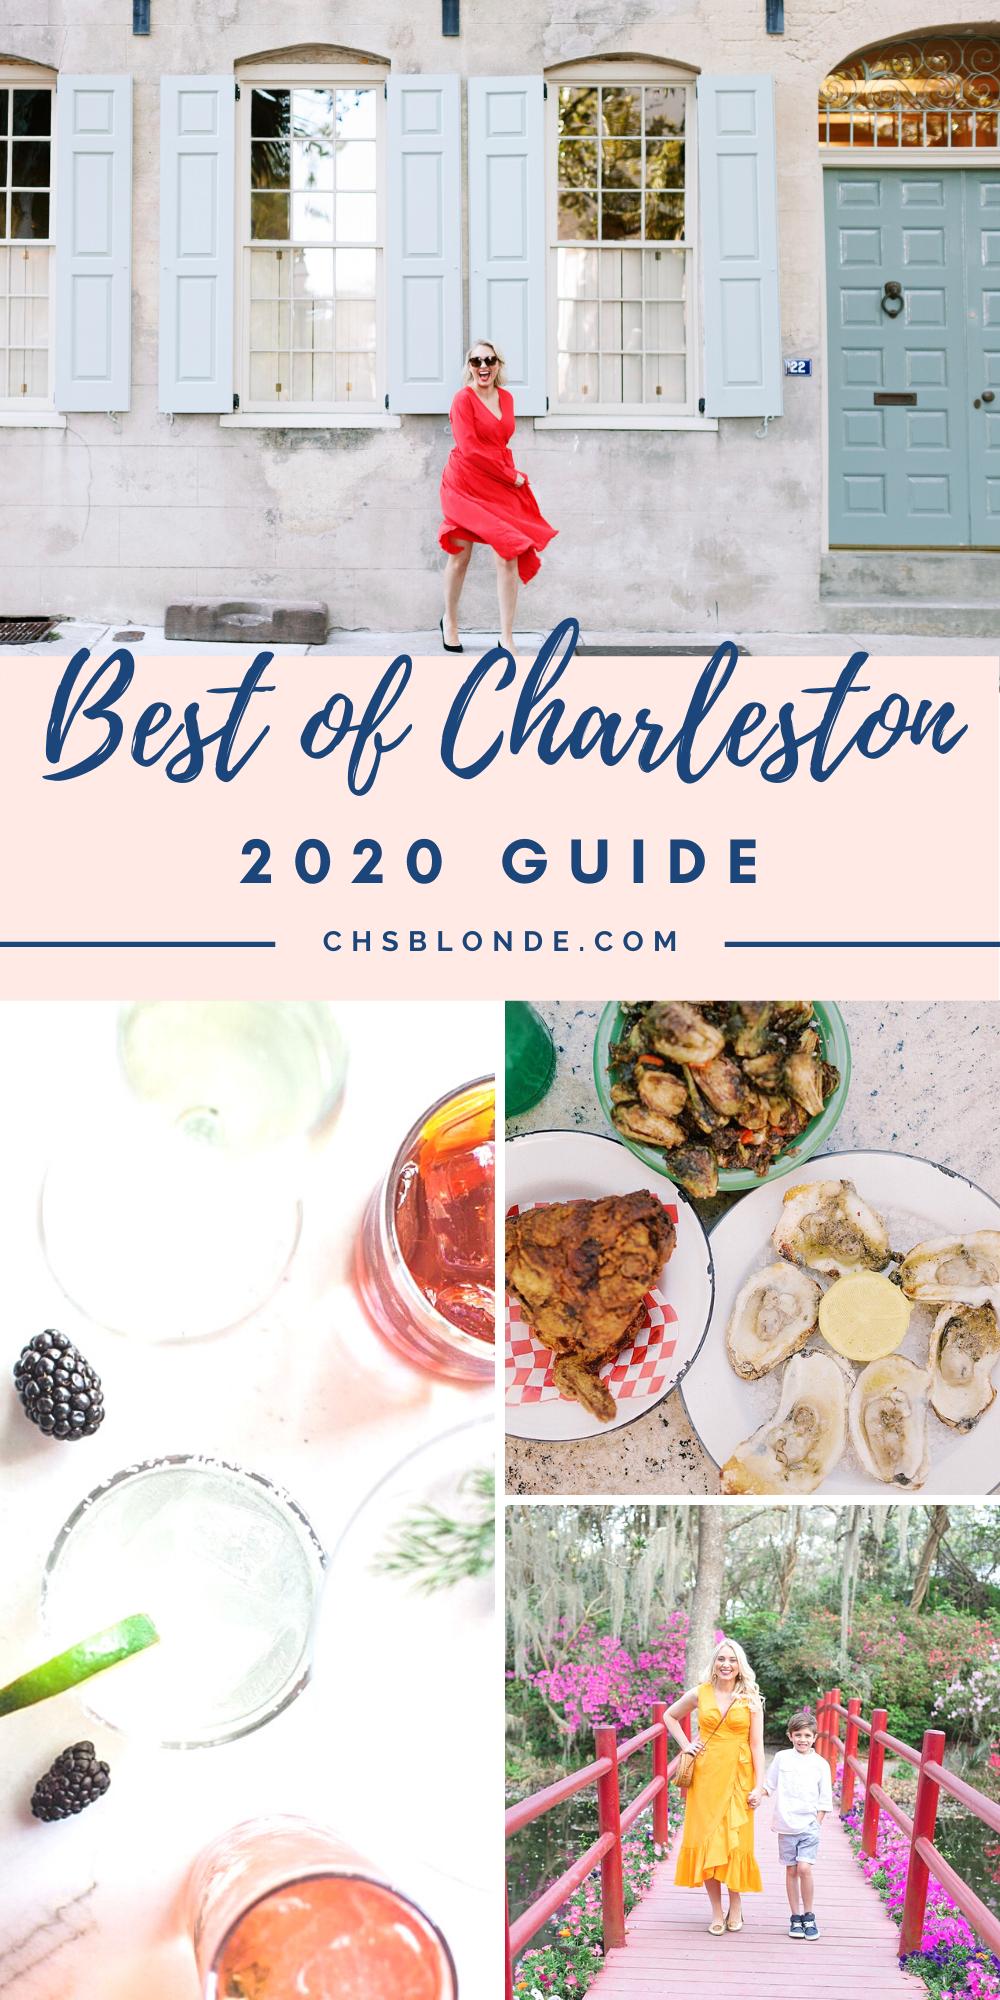 Best Businesses Of Charleston Guide 2020 Charleston Blonde In 2020 Charleston Charleston Vacation Charleston Travel